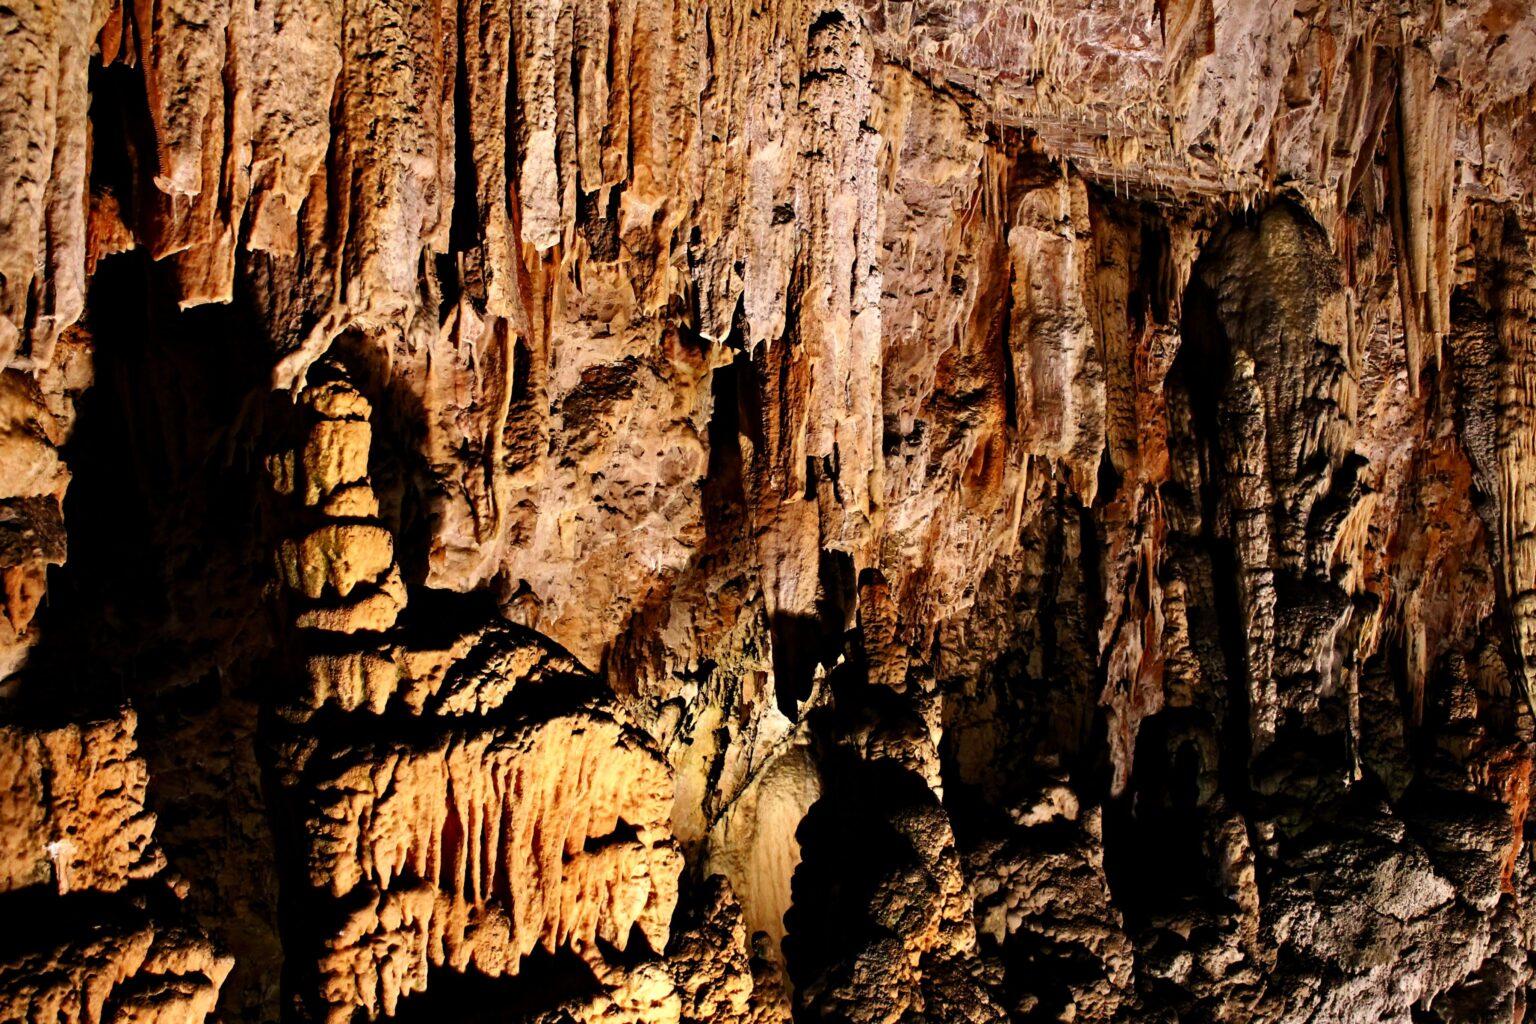 Grotta_gigante-1536x1024